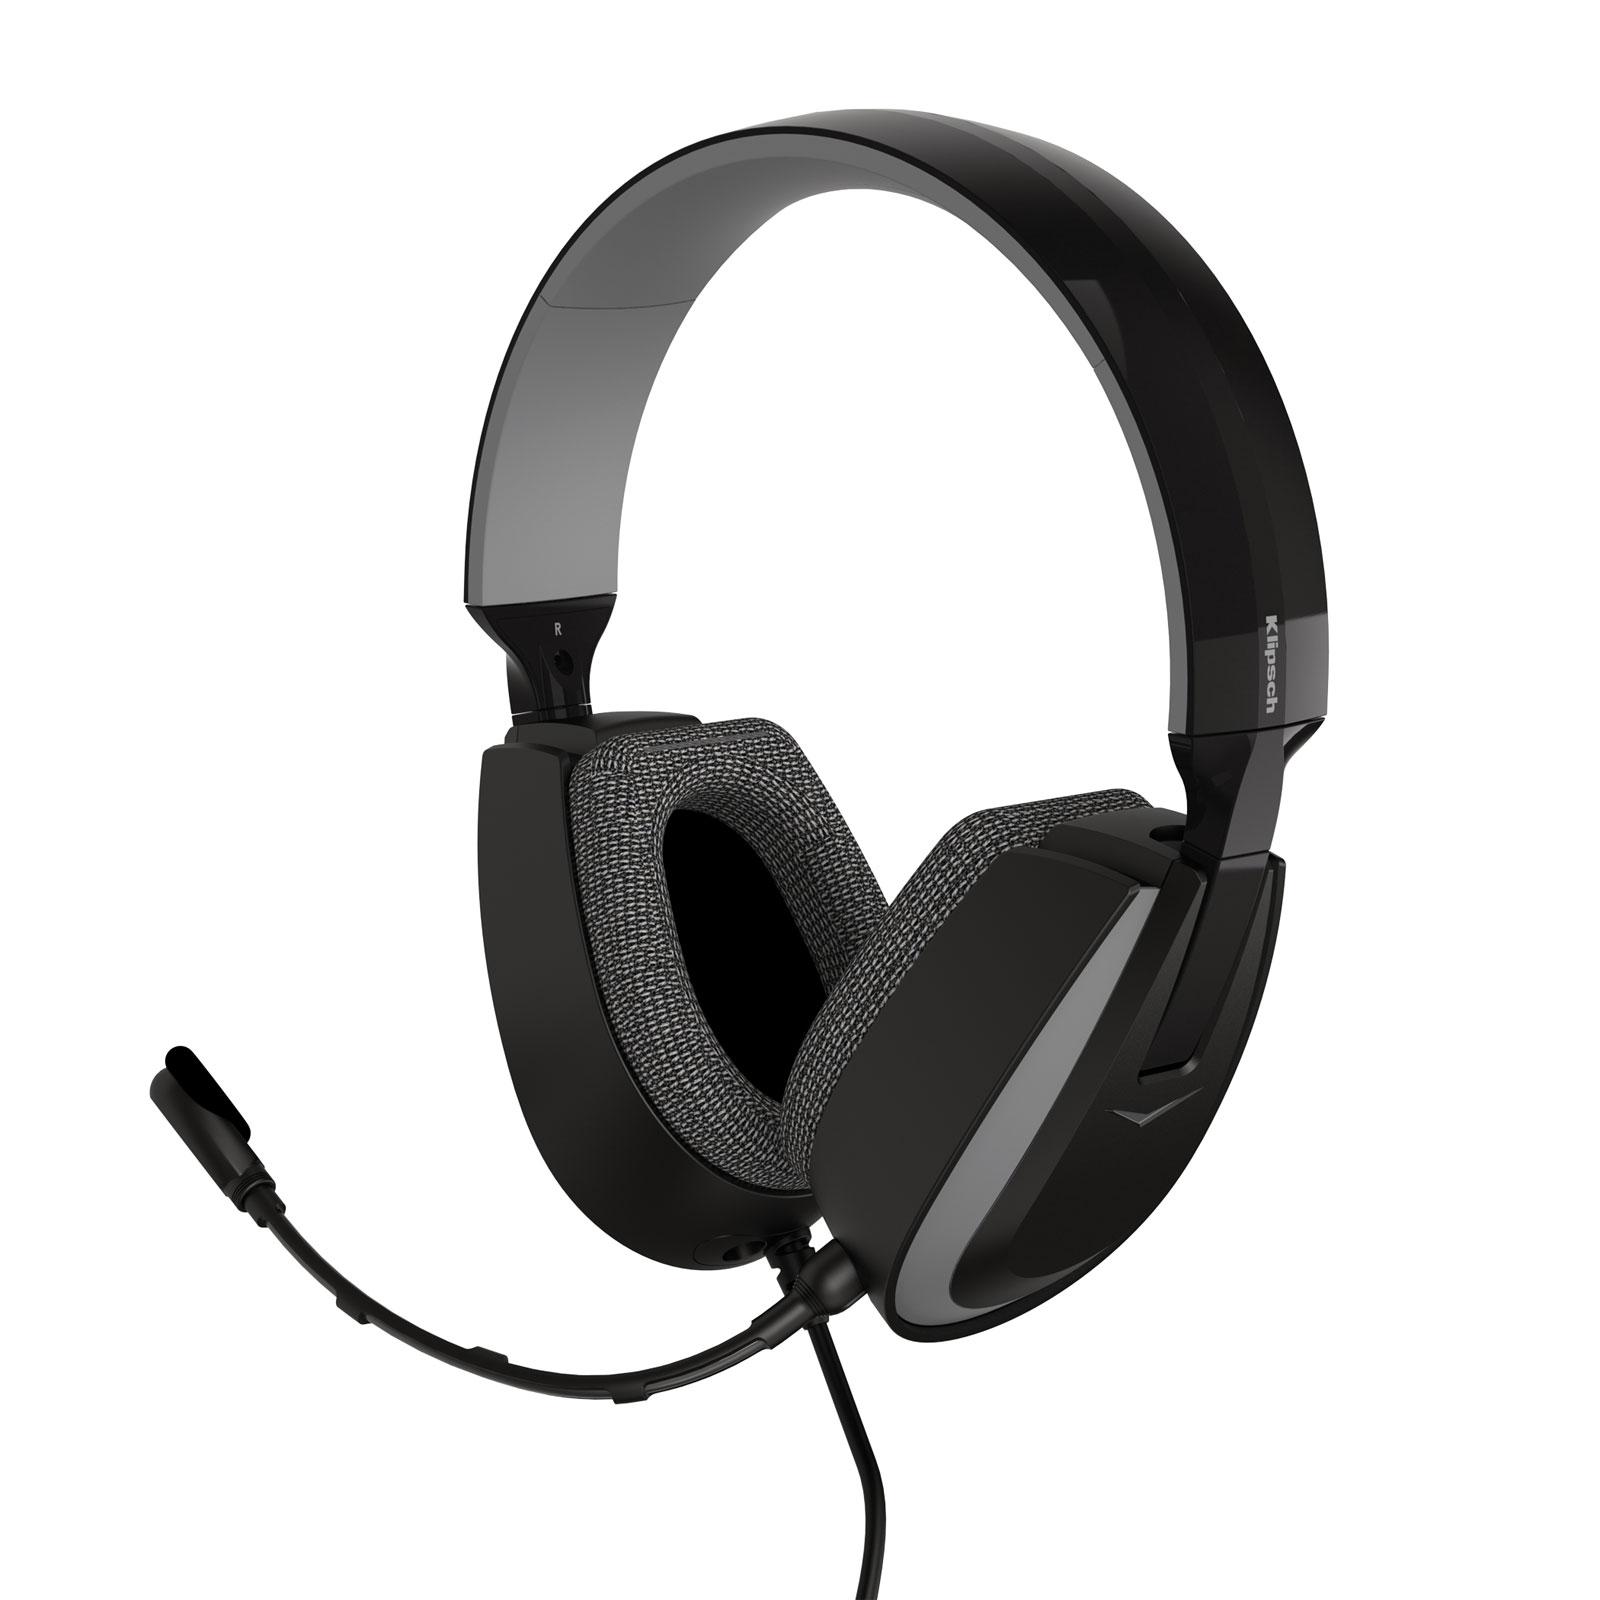 klipsch kg 200 pro audio wired gaming headset micro casque klipsch sur. Black Bedroom Furniture Sets. Home Design Ideas